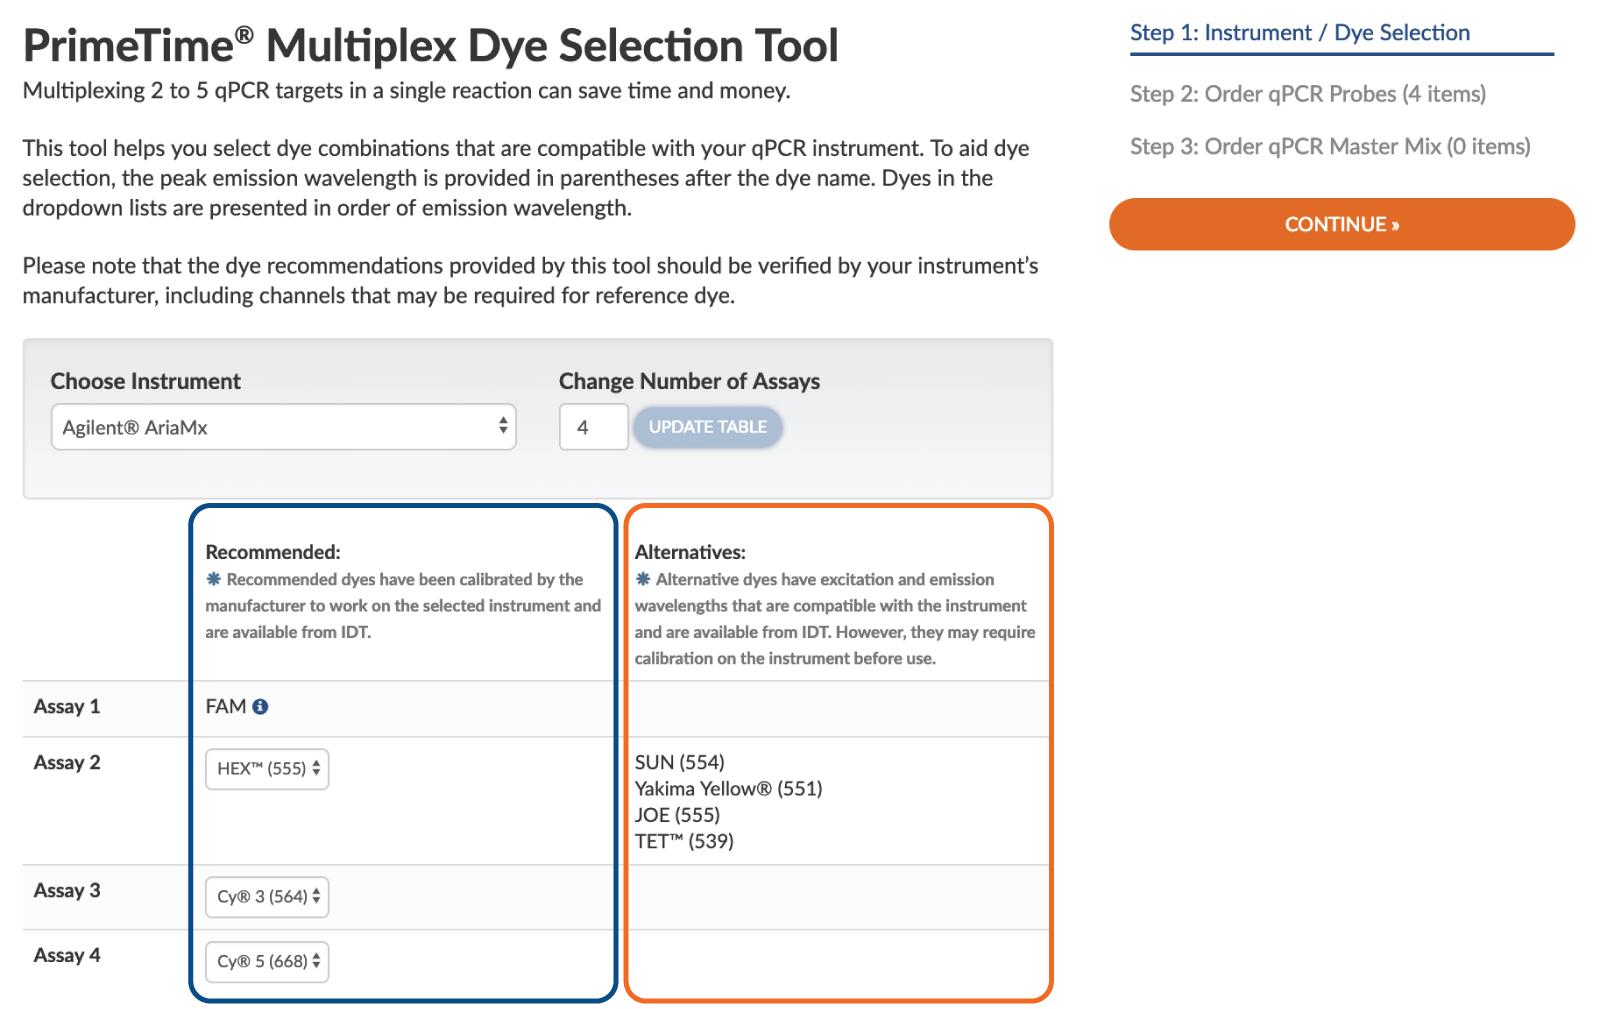 Multiplex qPCR dye selection tool for qPCR instruments